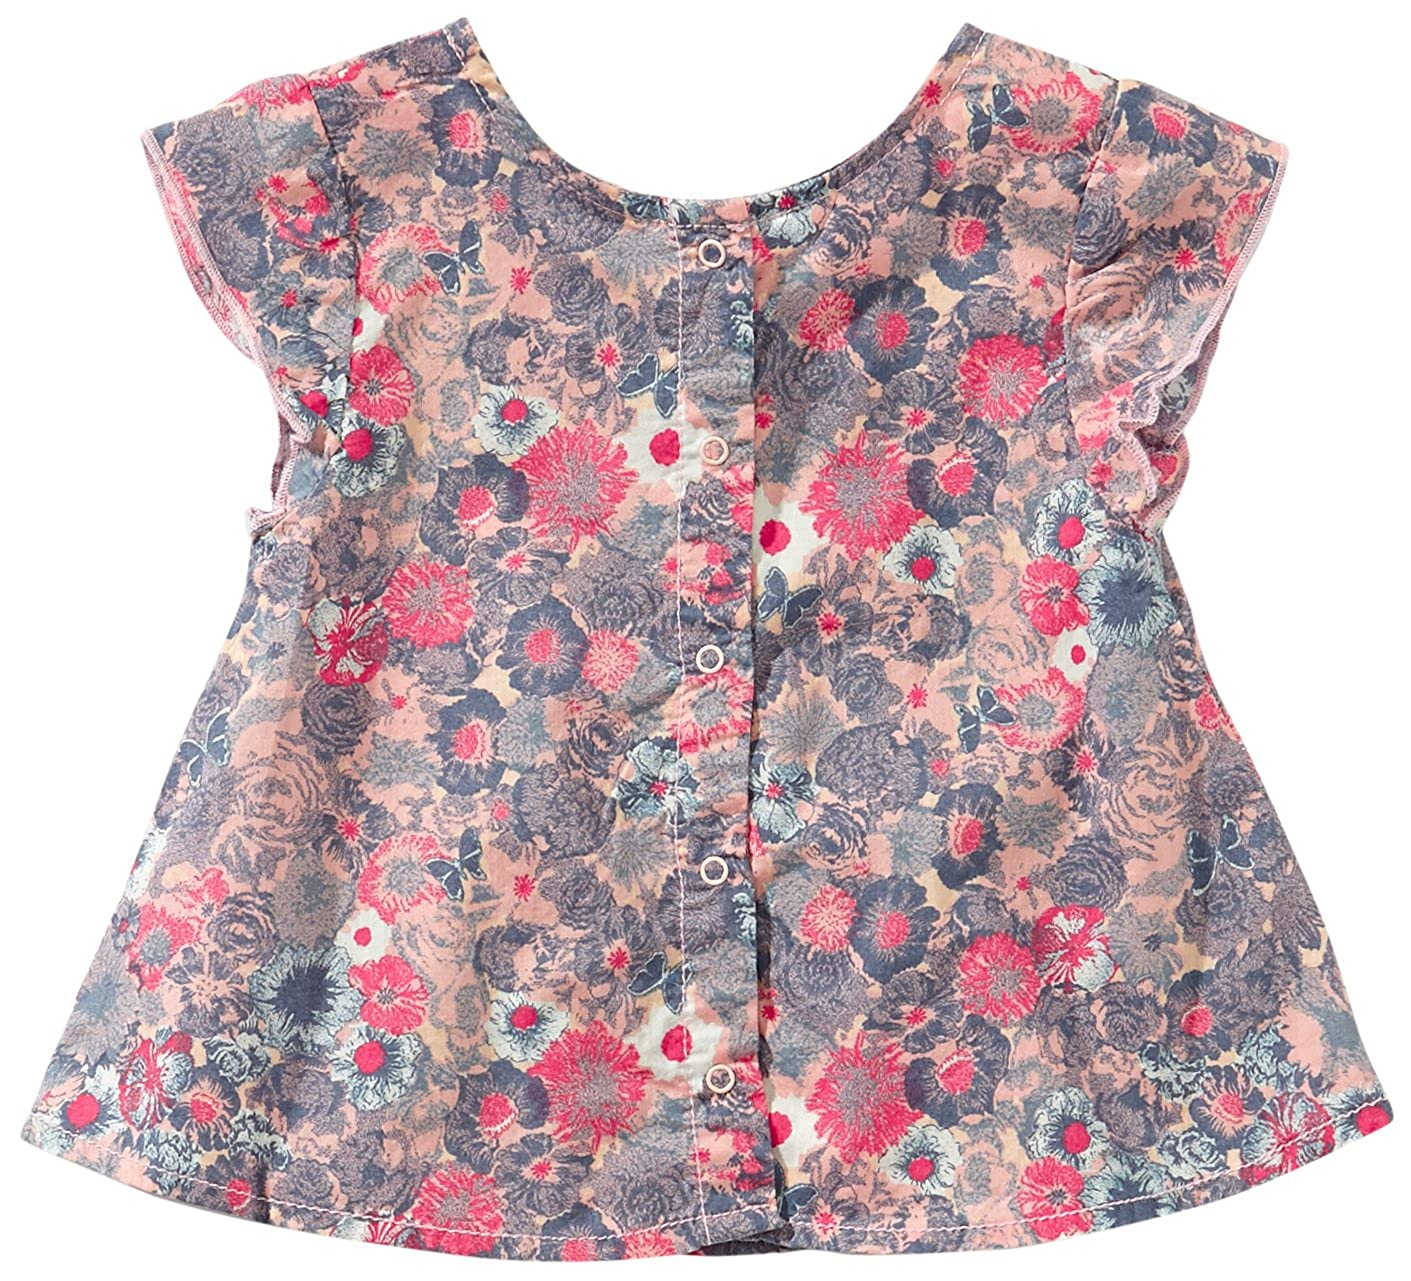 Mexx - Blusa con cuello redondo de manga corta para niña, talla L / 68 - talla alemana, color azul 404: Amazon.es: Ropa y accesorios